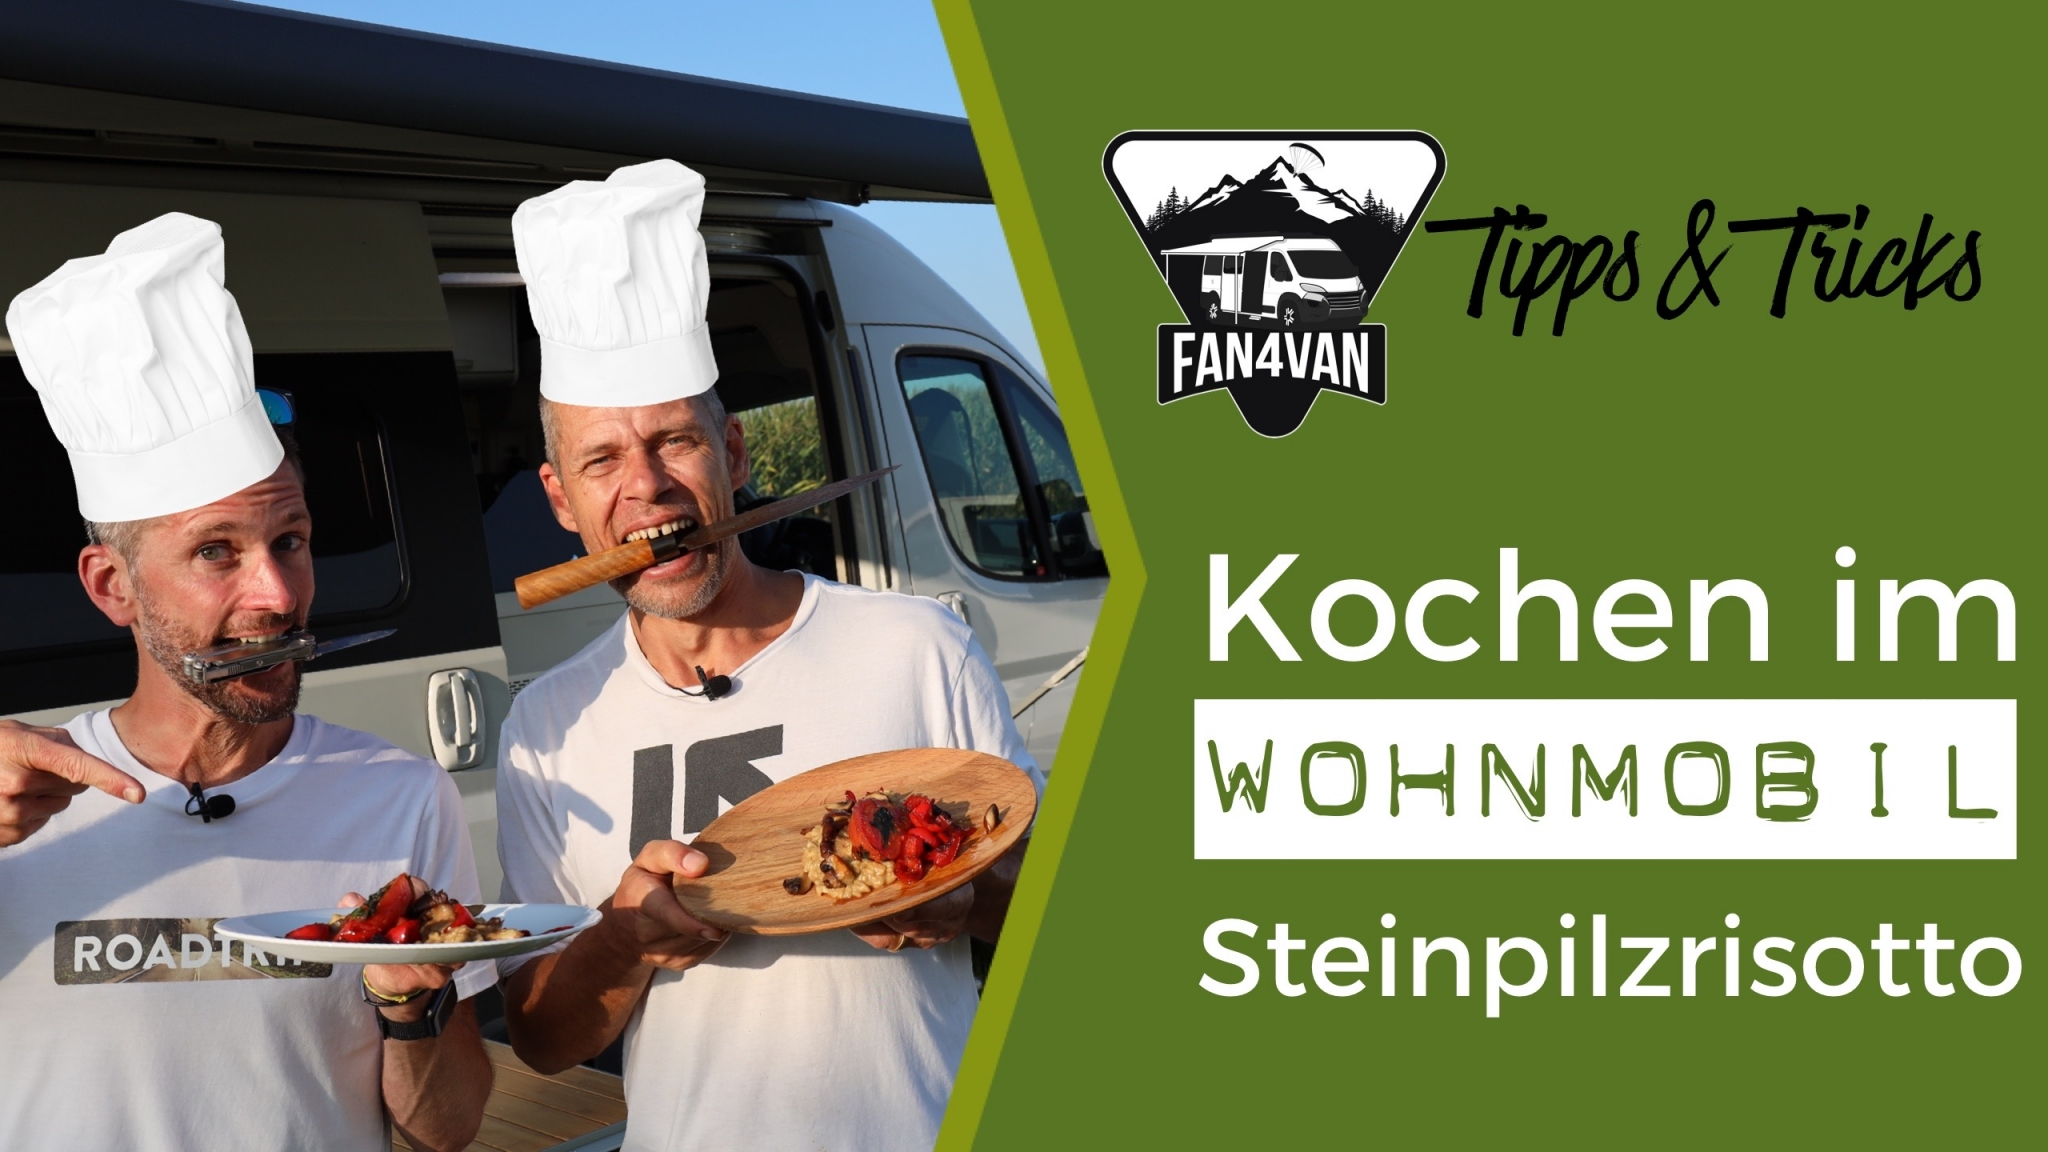 Camping Kochen - FAN4VAN kocht mit Surdham im Wohnmonbil